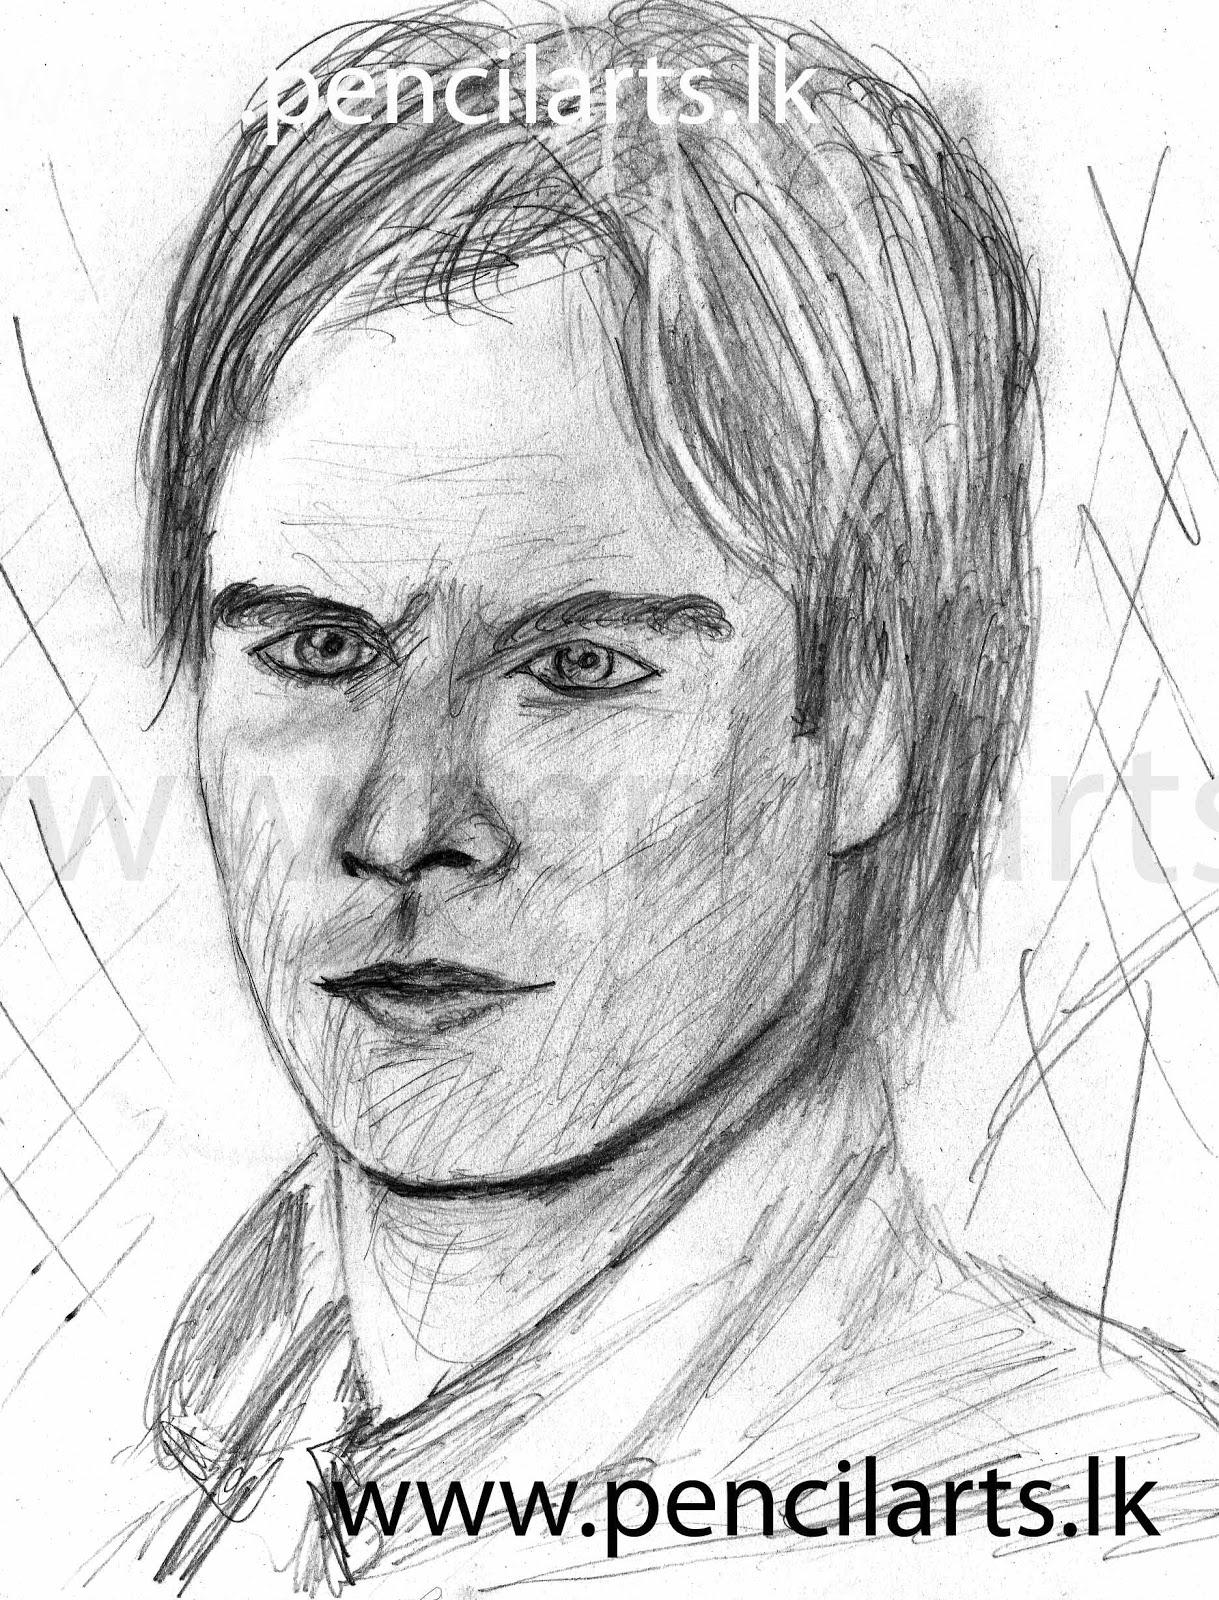 http://4.bp.blogspot.com/-B45O2cS8hTk/UMOpB-aOQVI/AAAAAAAAAhM/SkhPTkvuIKQ/s1600/Ian-Somerhalder--the-vampire-diaries-actor-1.jpg